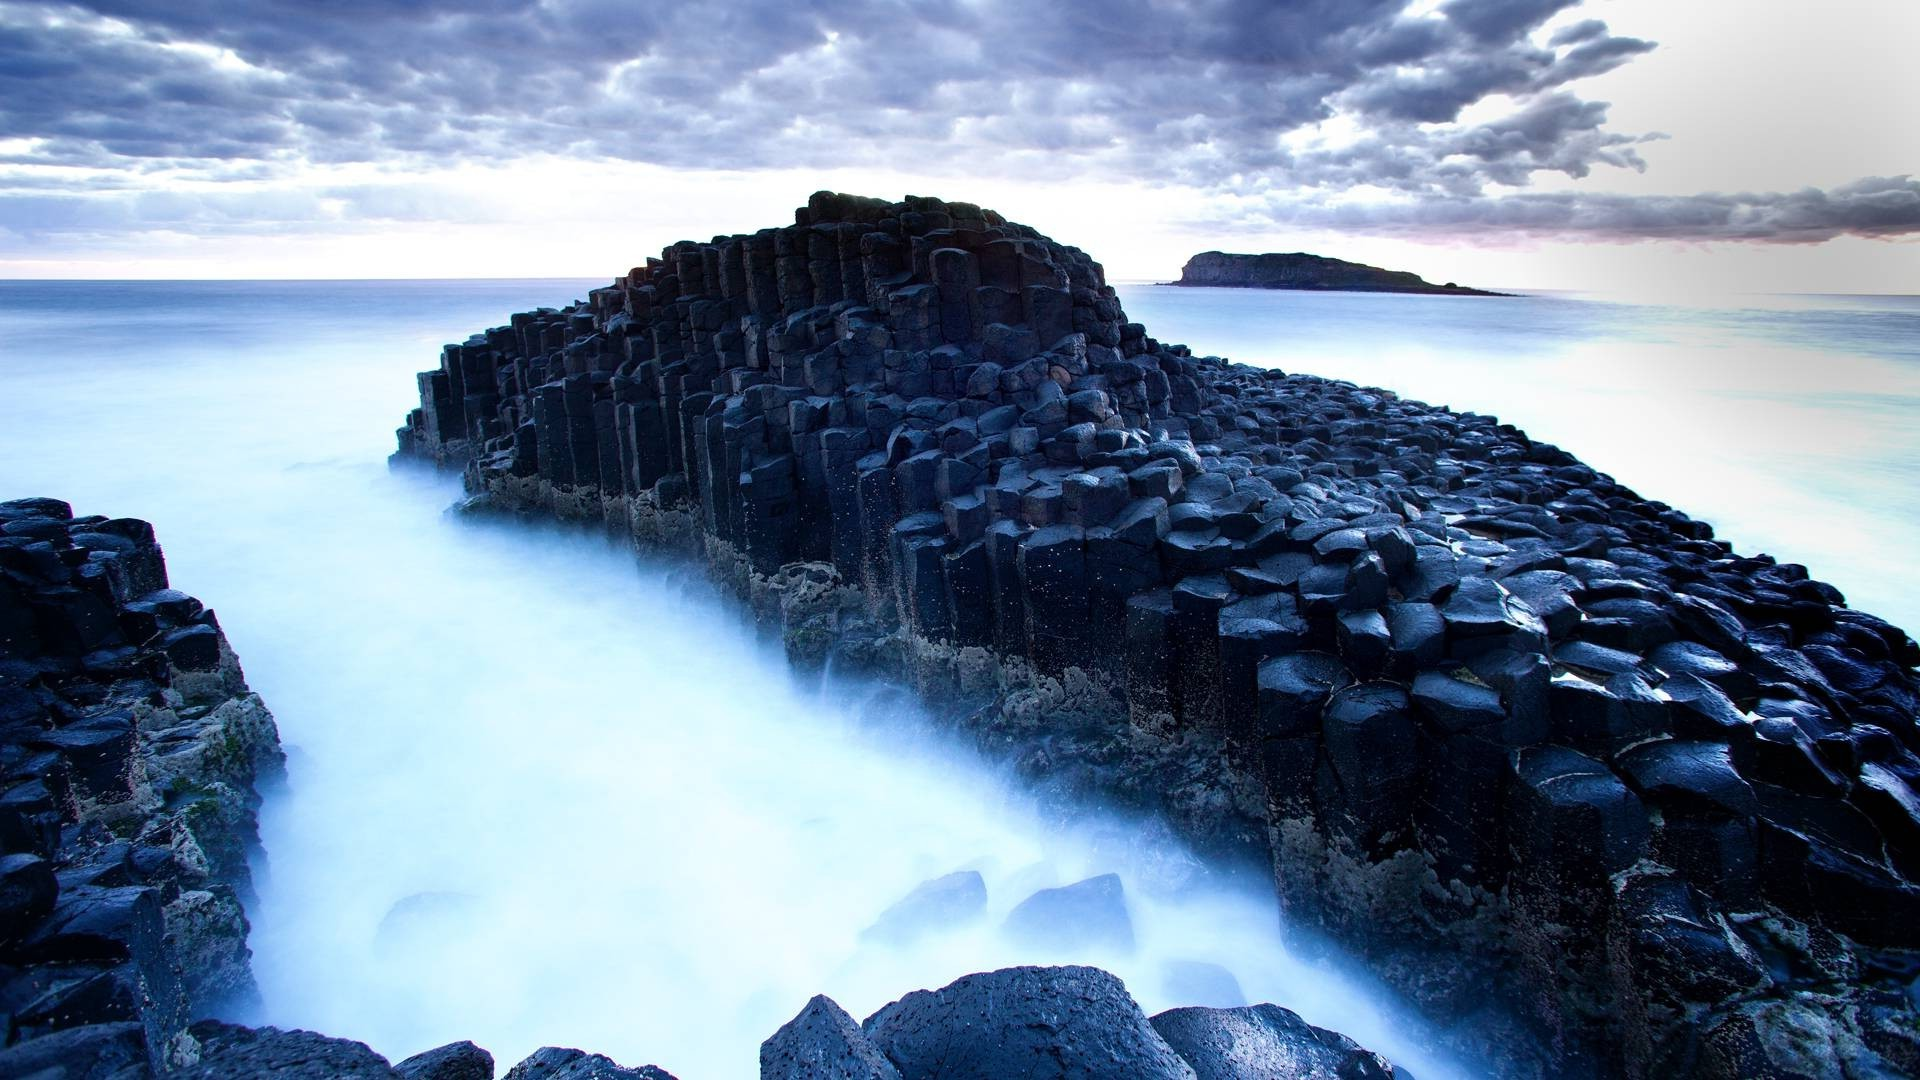 photography Giants Causeway Ireland Nature Landscape Coast 1920x1080